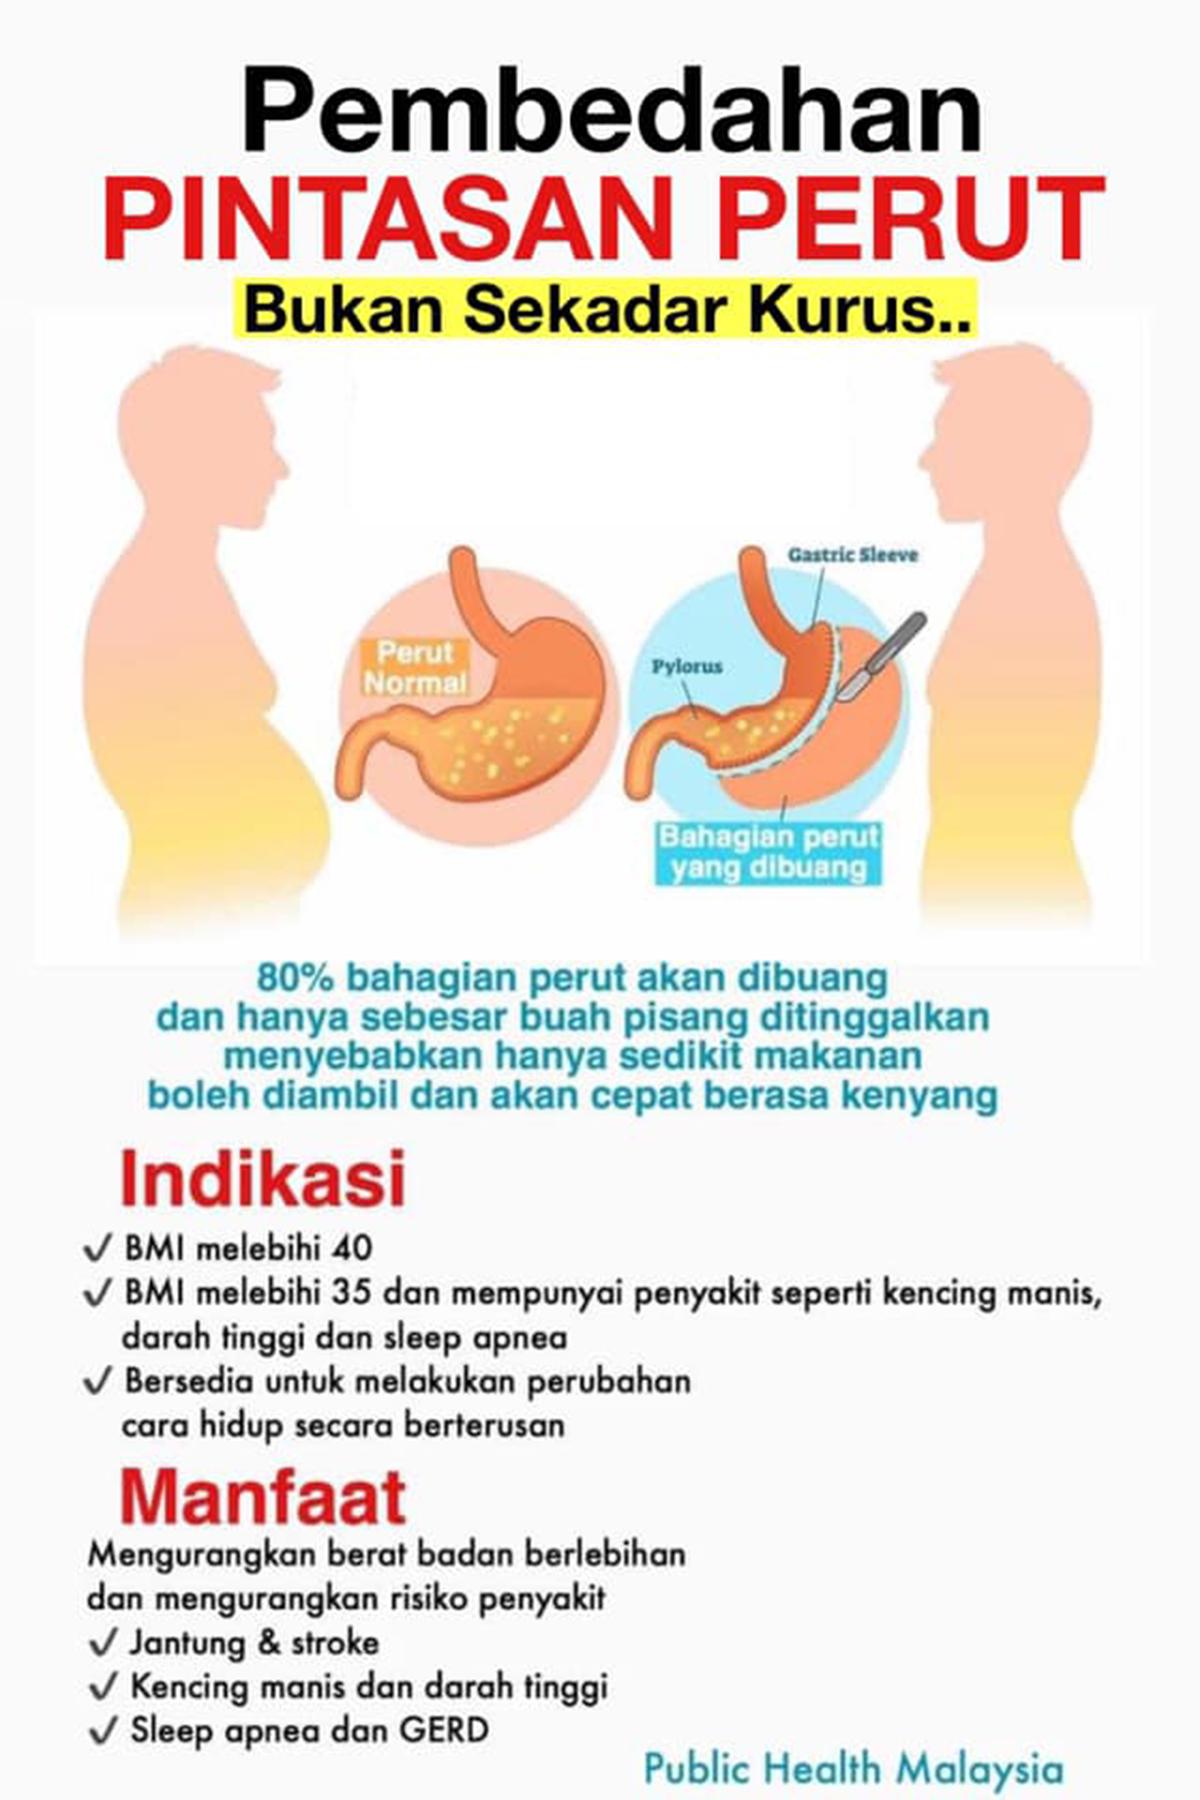 Pembedahan Bariatrik Potong Usus/Perut Cara Cepat Kurus